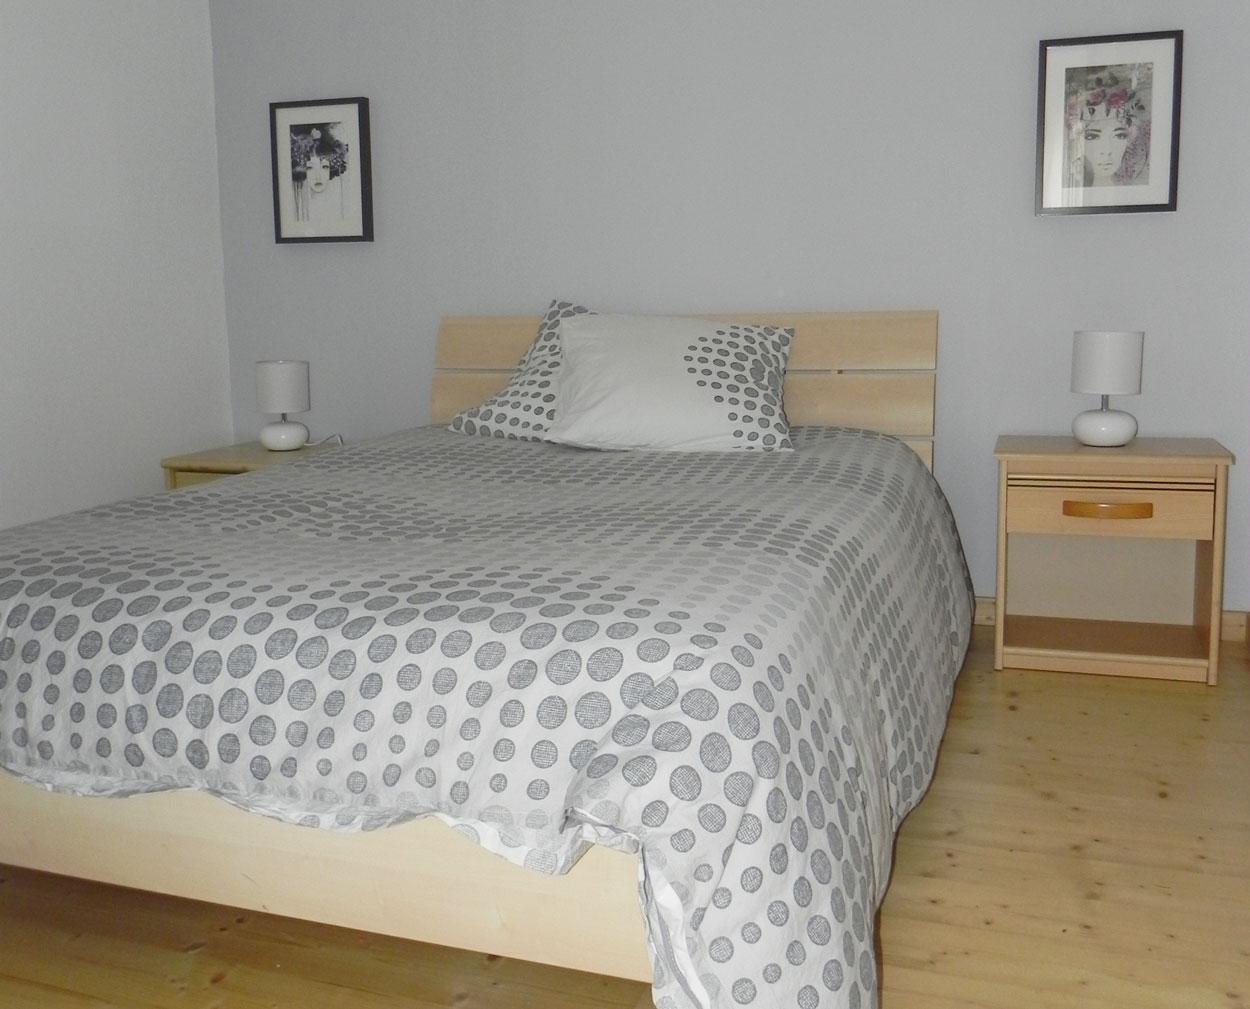 chambres louer nid de cigognes rosheim. Black Bedroom Furniture Sets. Home Design Ideas